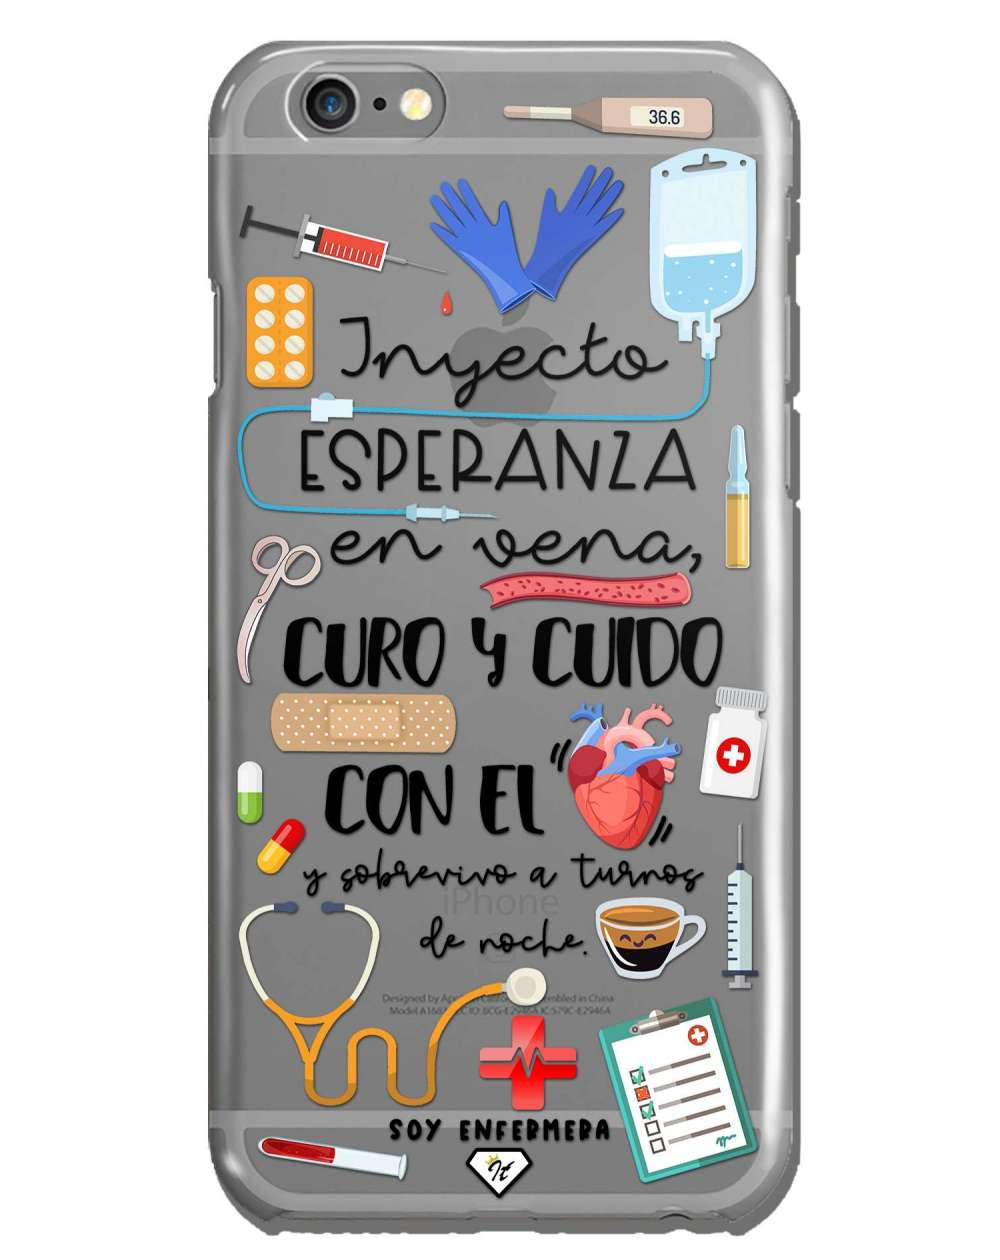 Enfermeria 2.0